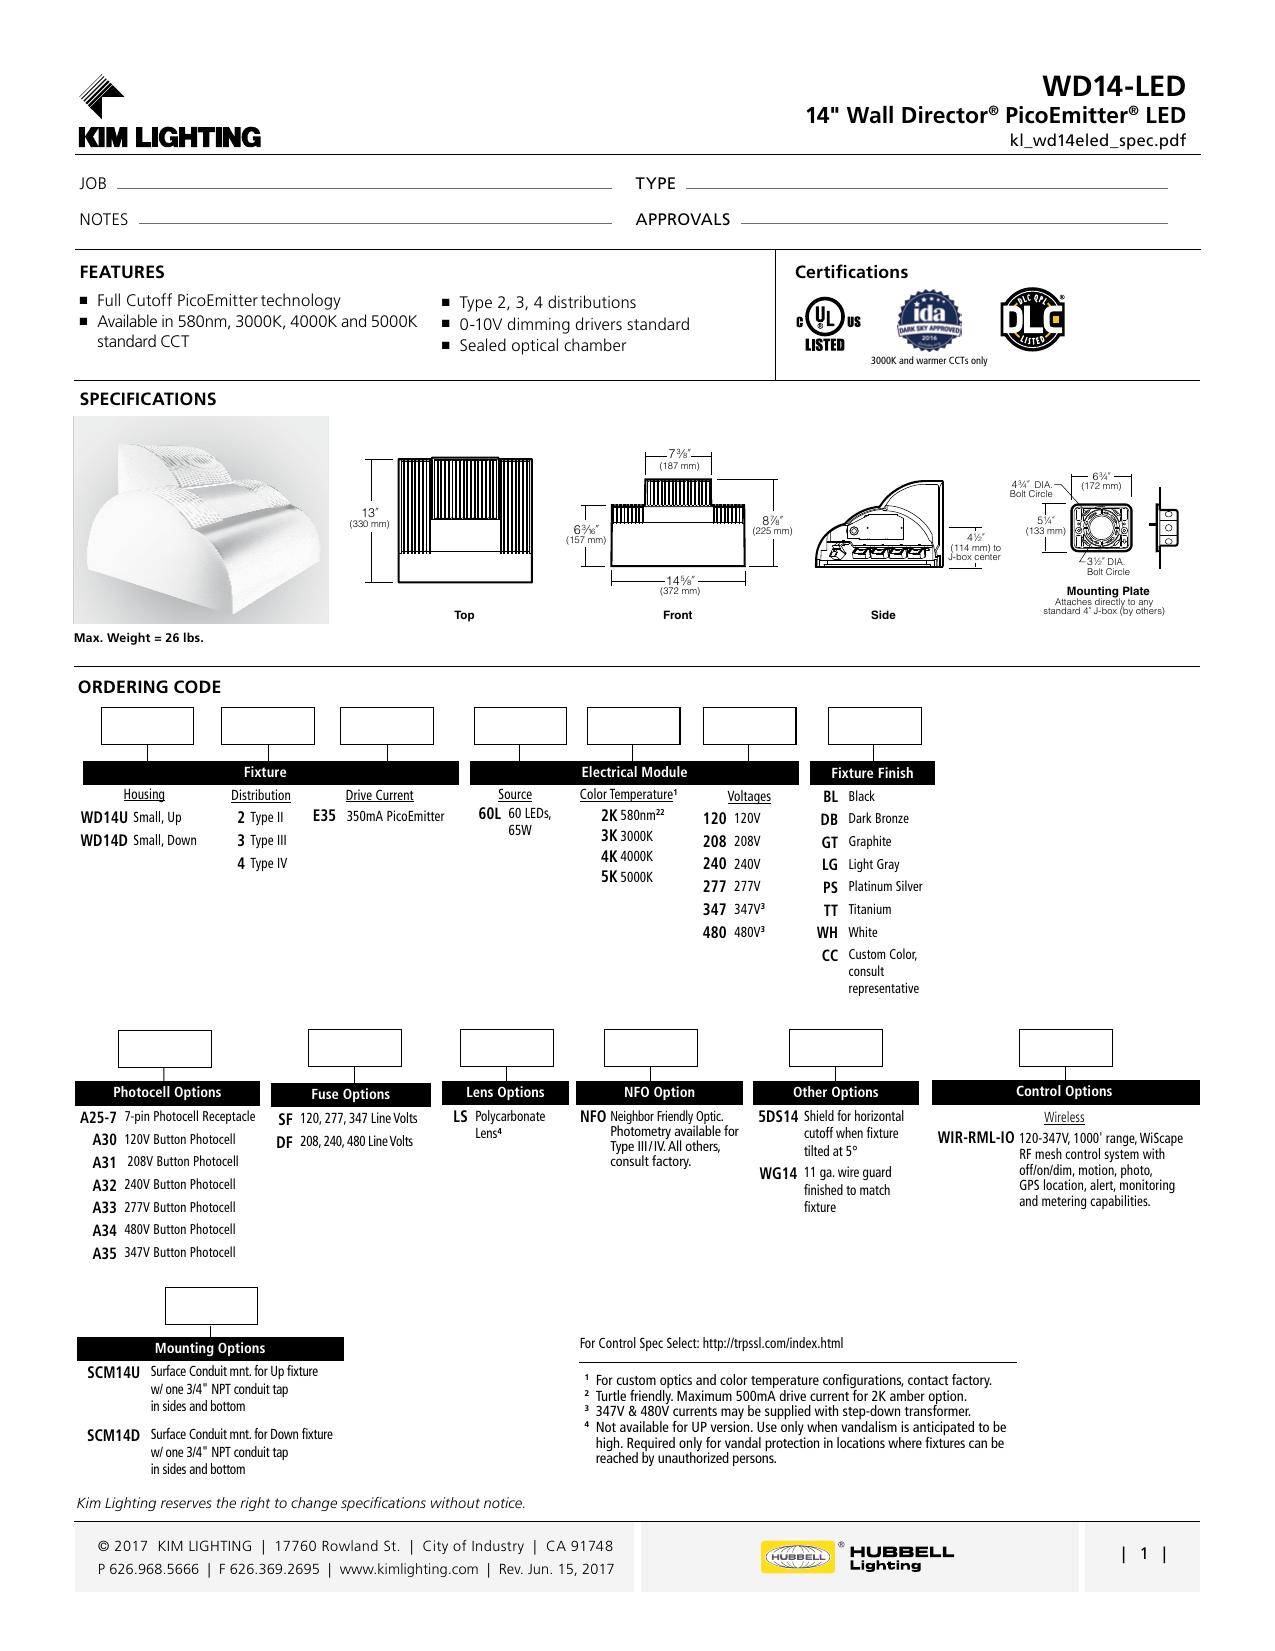 Wd14 Led Kim Lighting Manualzz